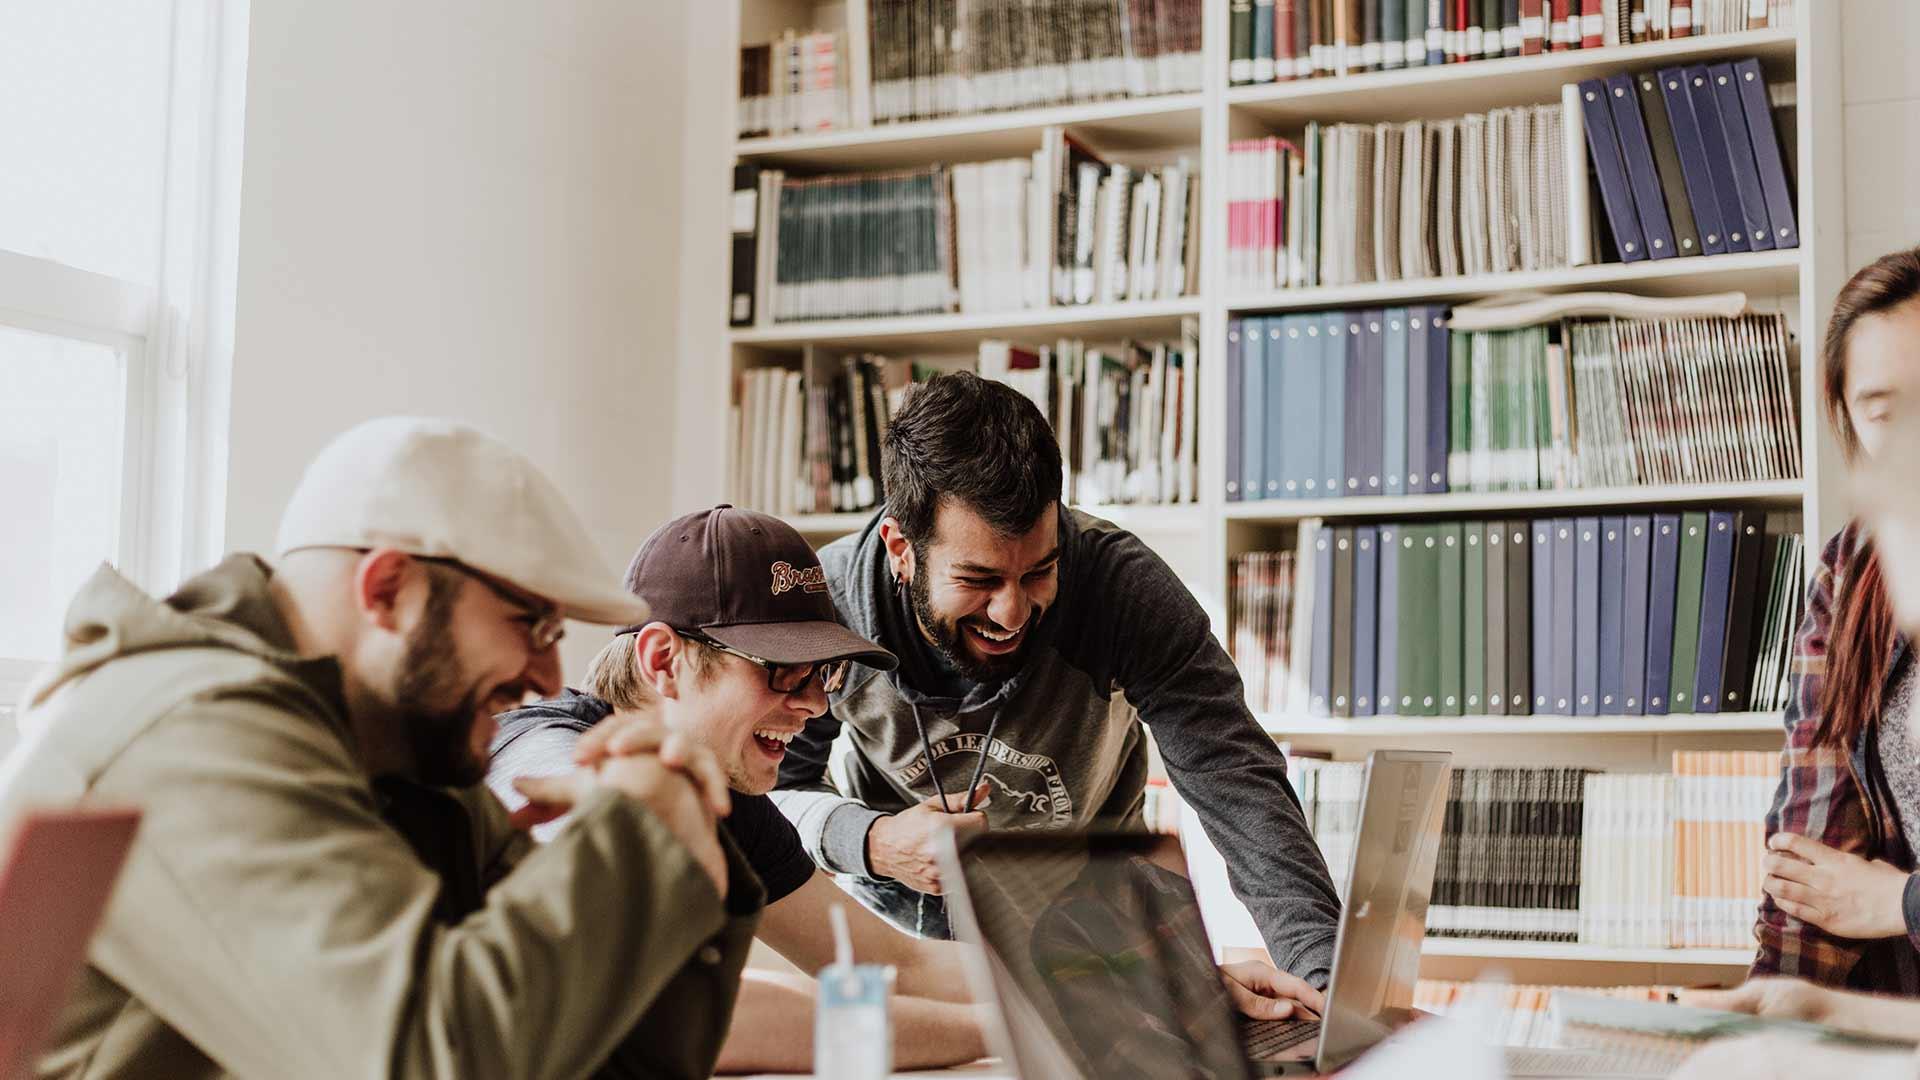 Men at Computer Laughing